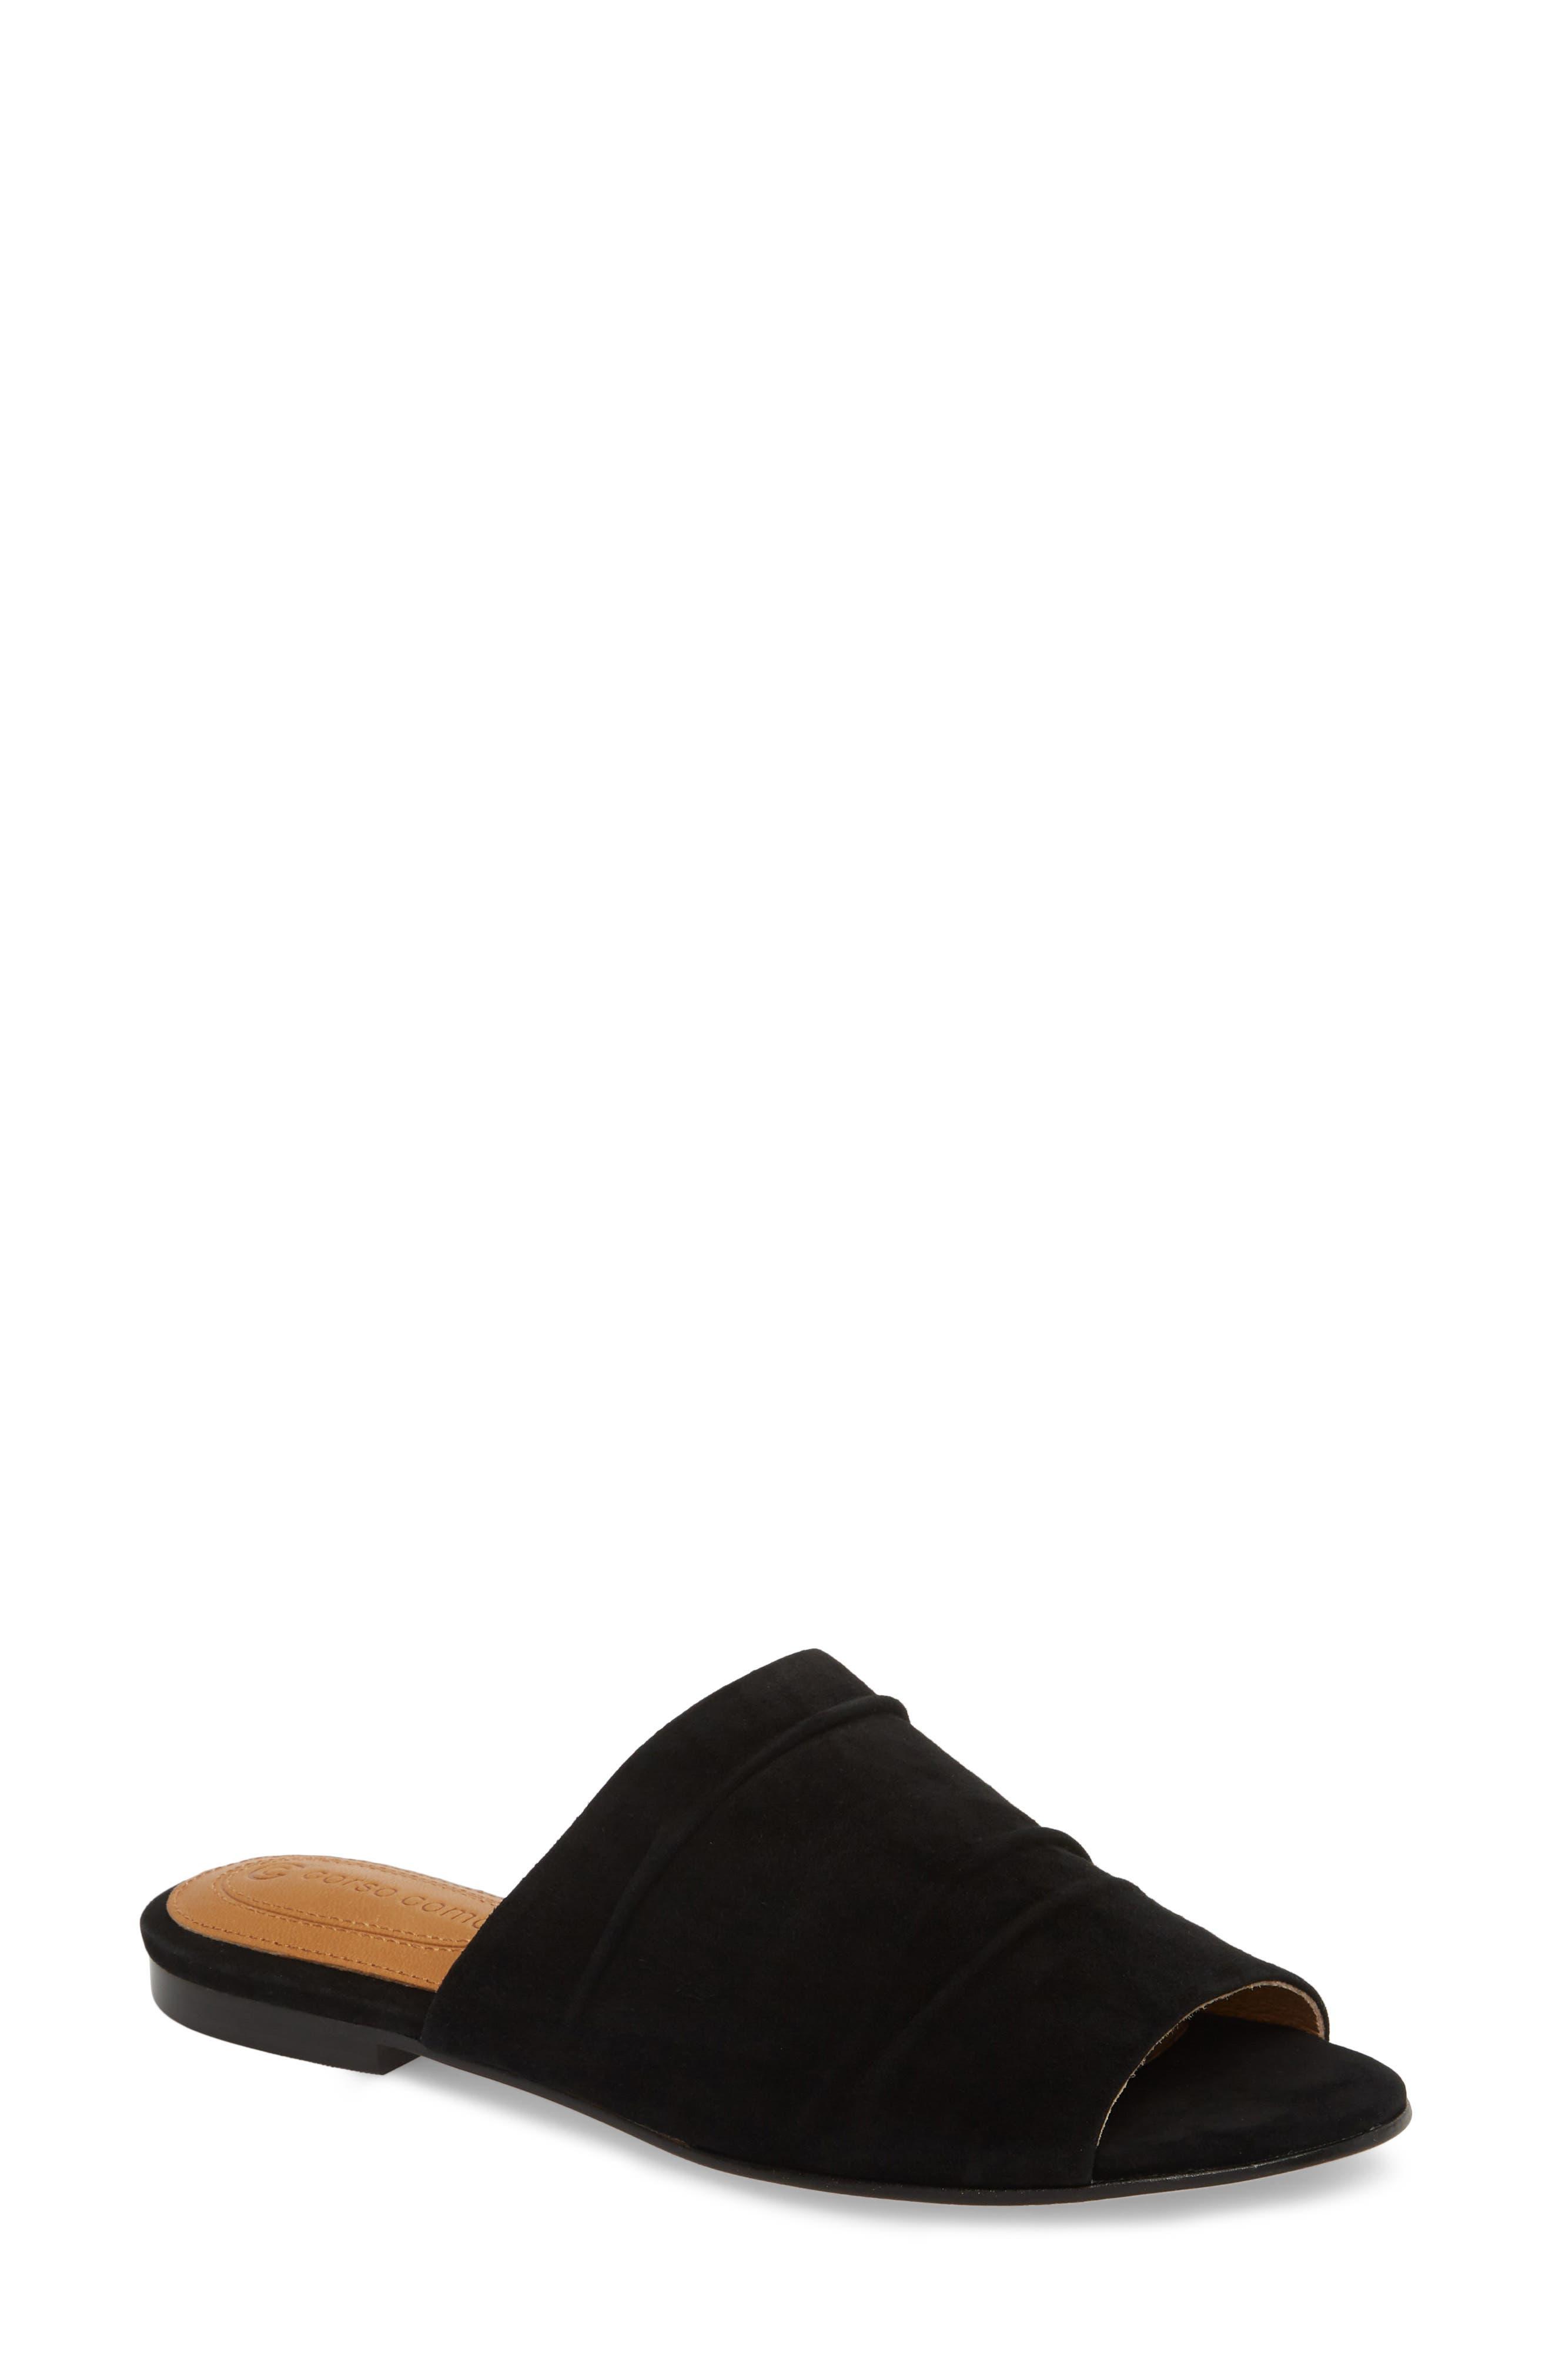 Beachaven Slide Sandal,                             Main thumbnail 1, color,                             Black Suede